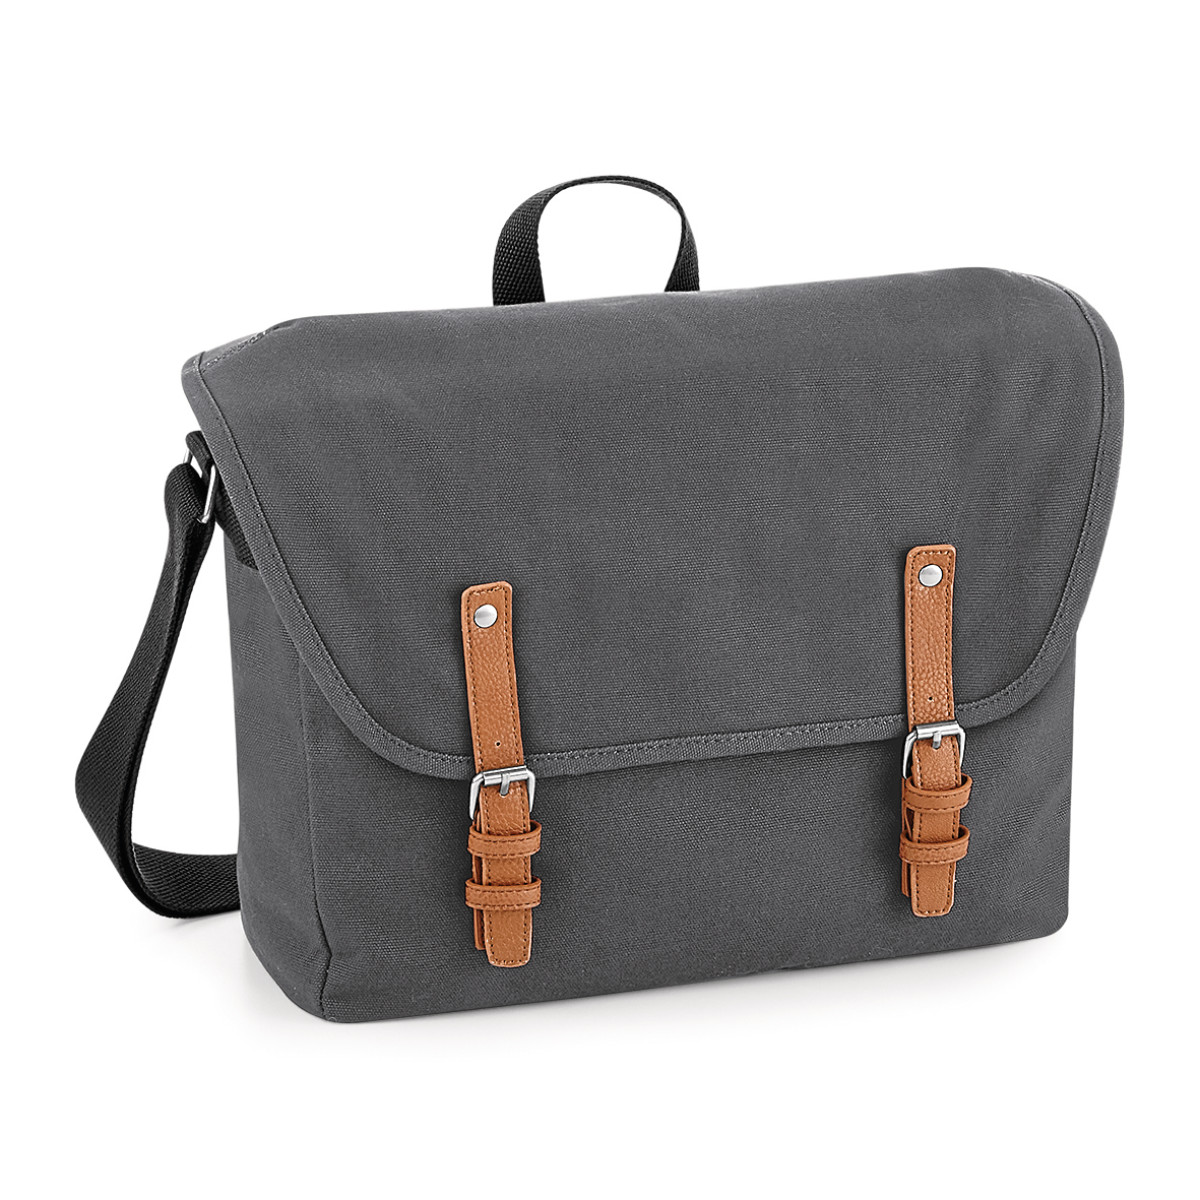 Quadra Vintage Messenger Bag (One Size) (Graphite Grey)